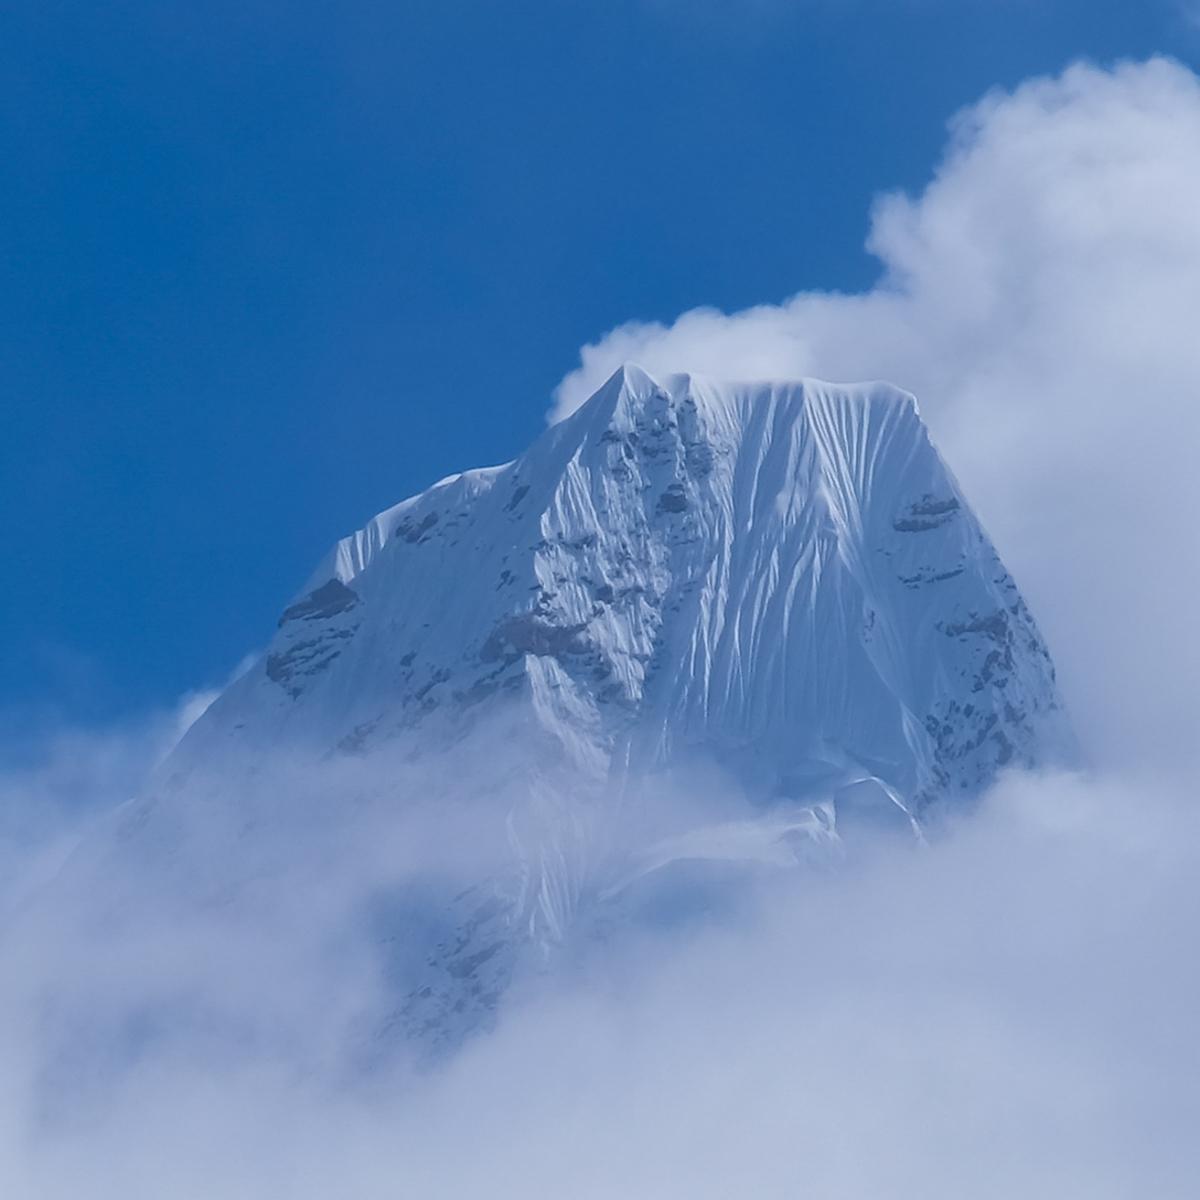 Everest Base Camp, Everest 3 pass #2 3